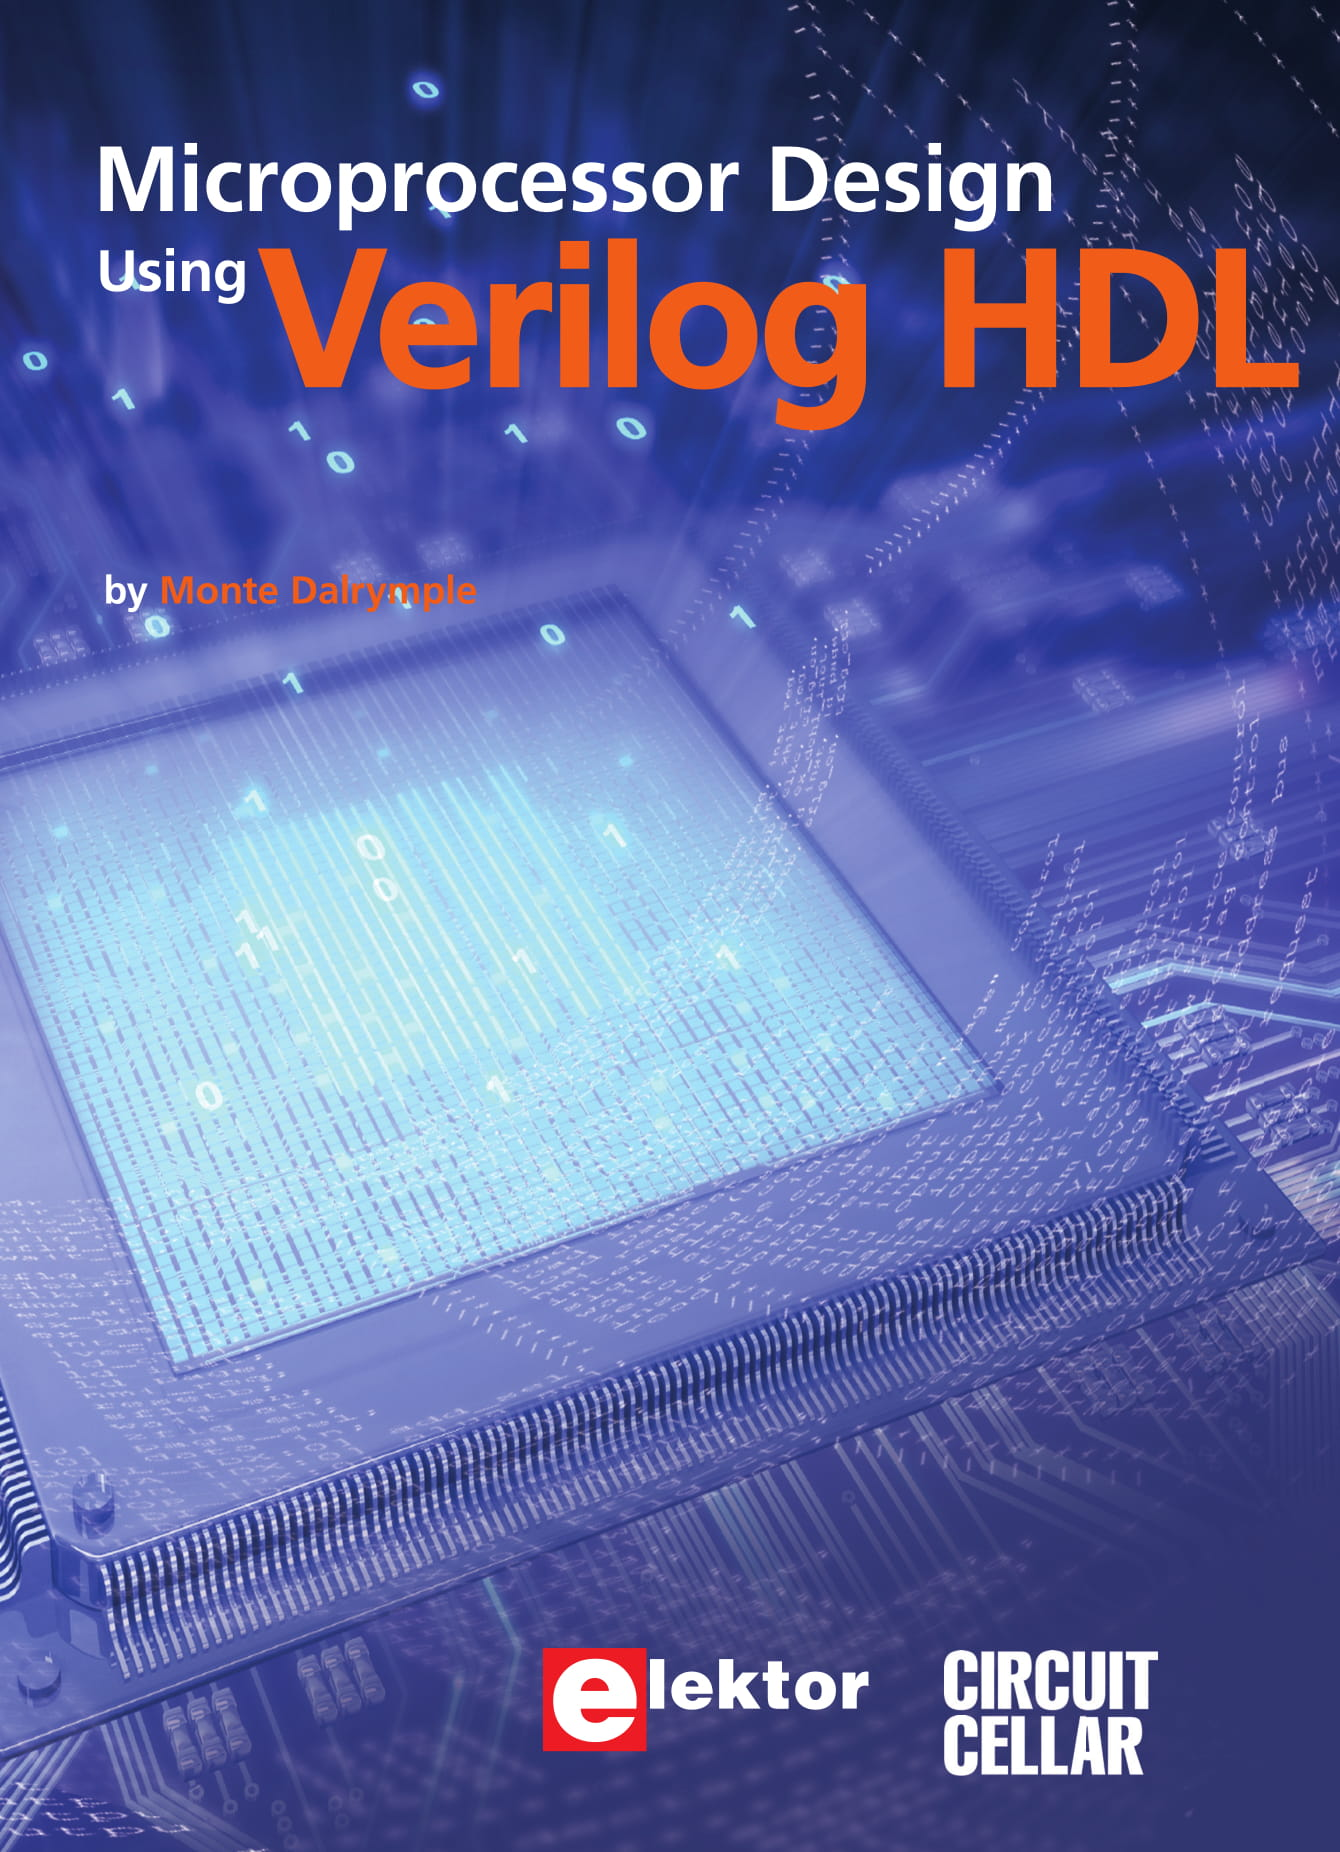 Microprocessor Design Using Verilog HDL(E-BOOK)